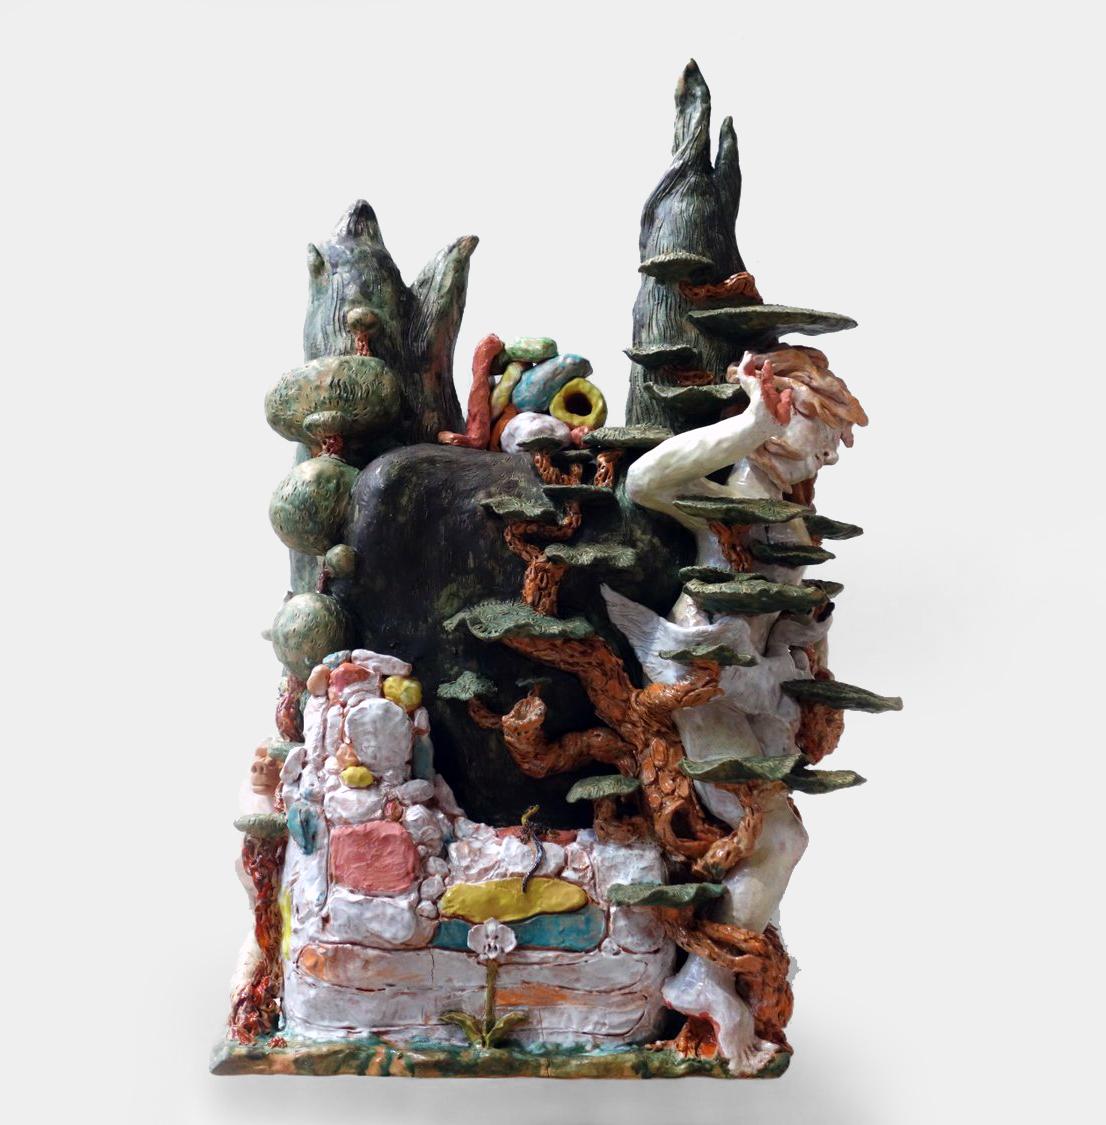 Chris Hammerlein, Leda, 2016, glasierte Keramik, 106 x 70 x 52 cm